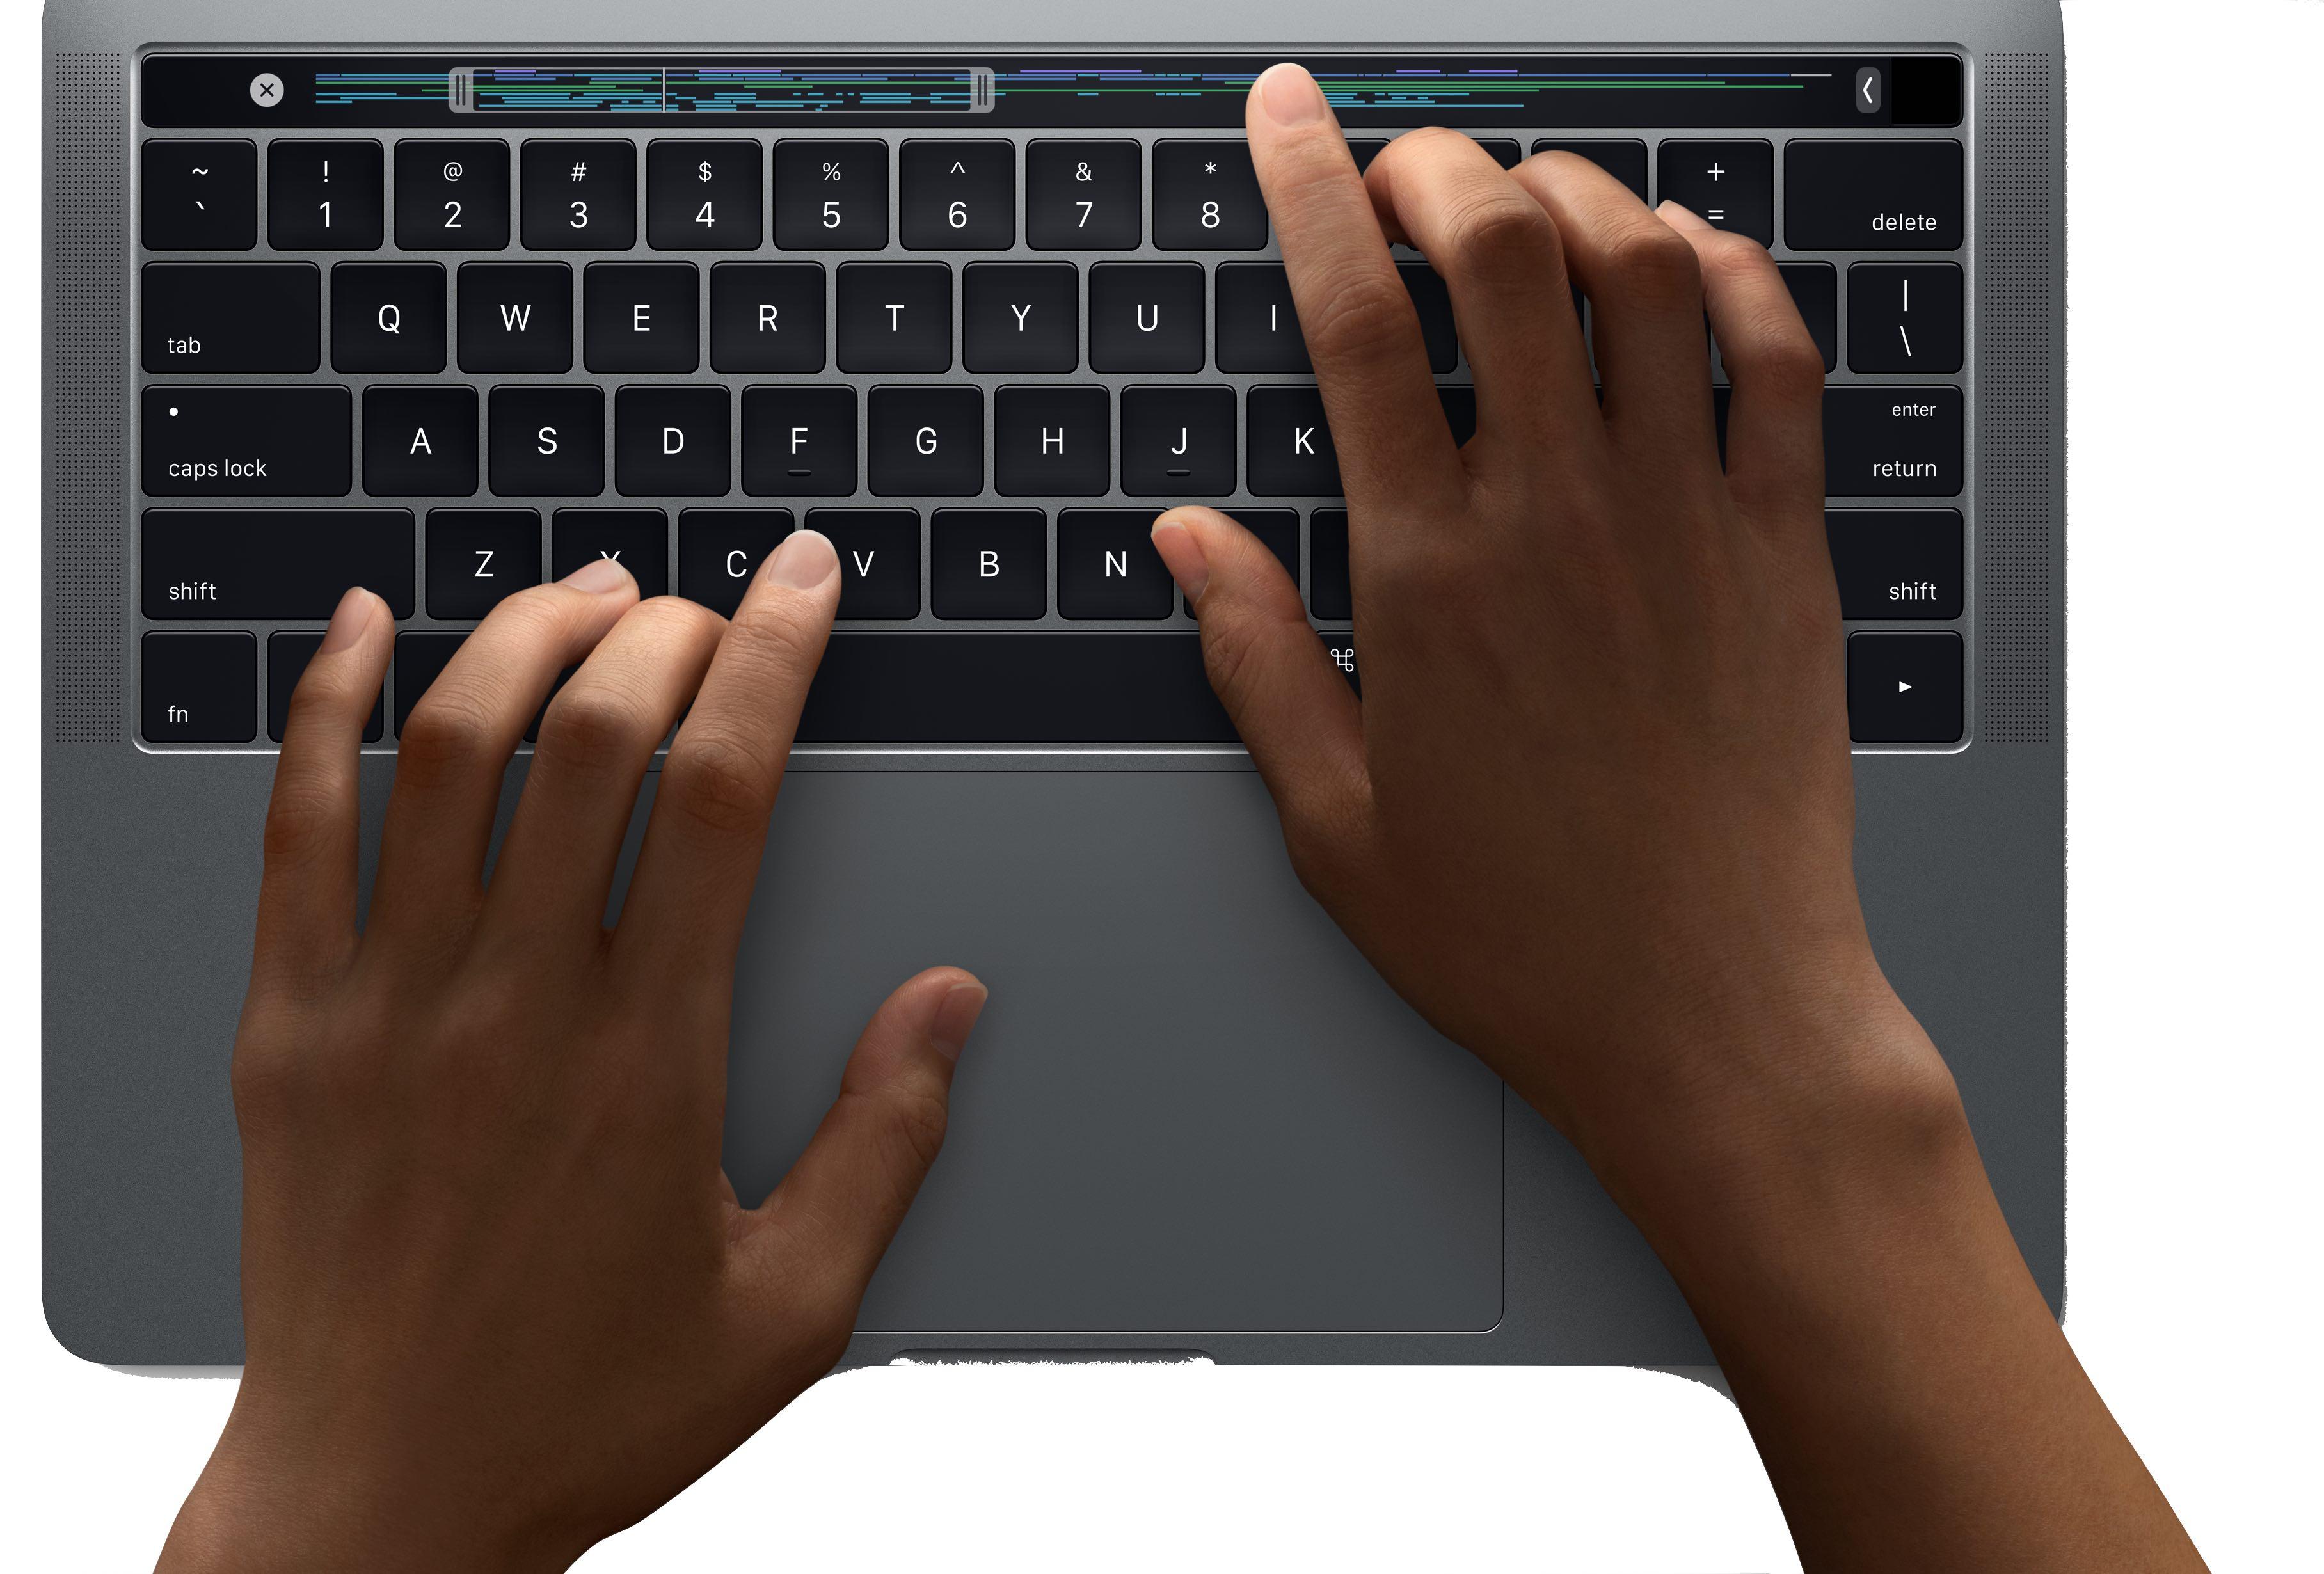 mac multi touch trackpad windows 7